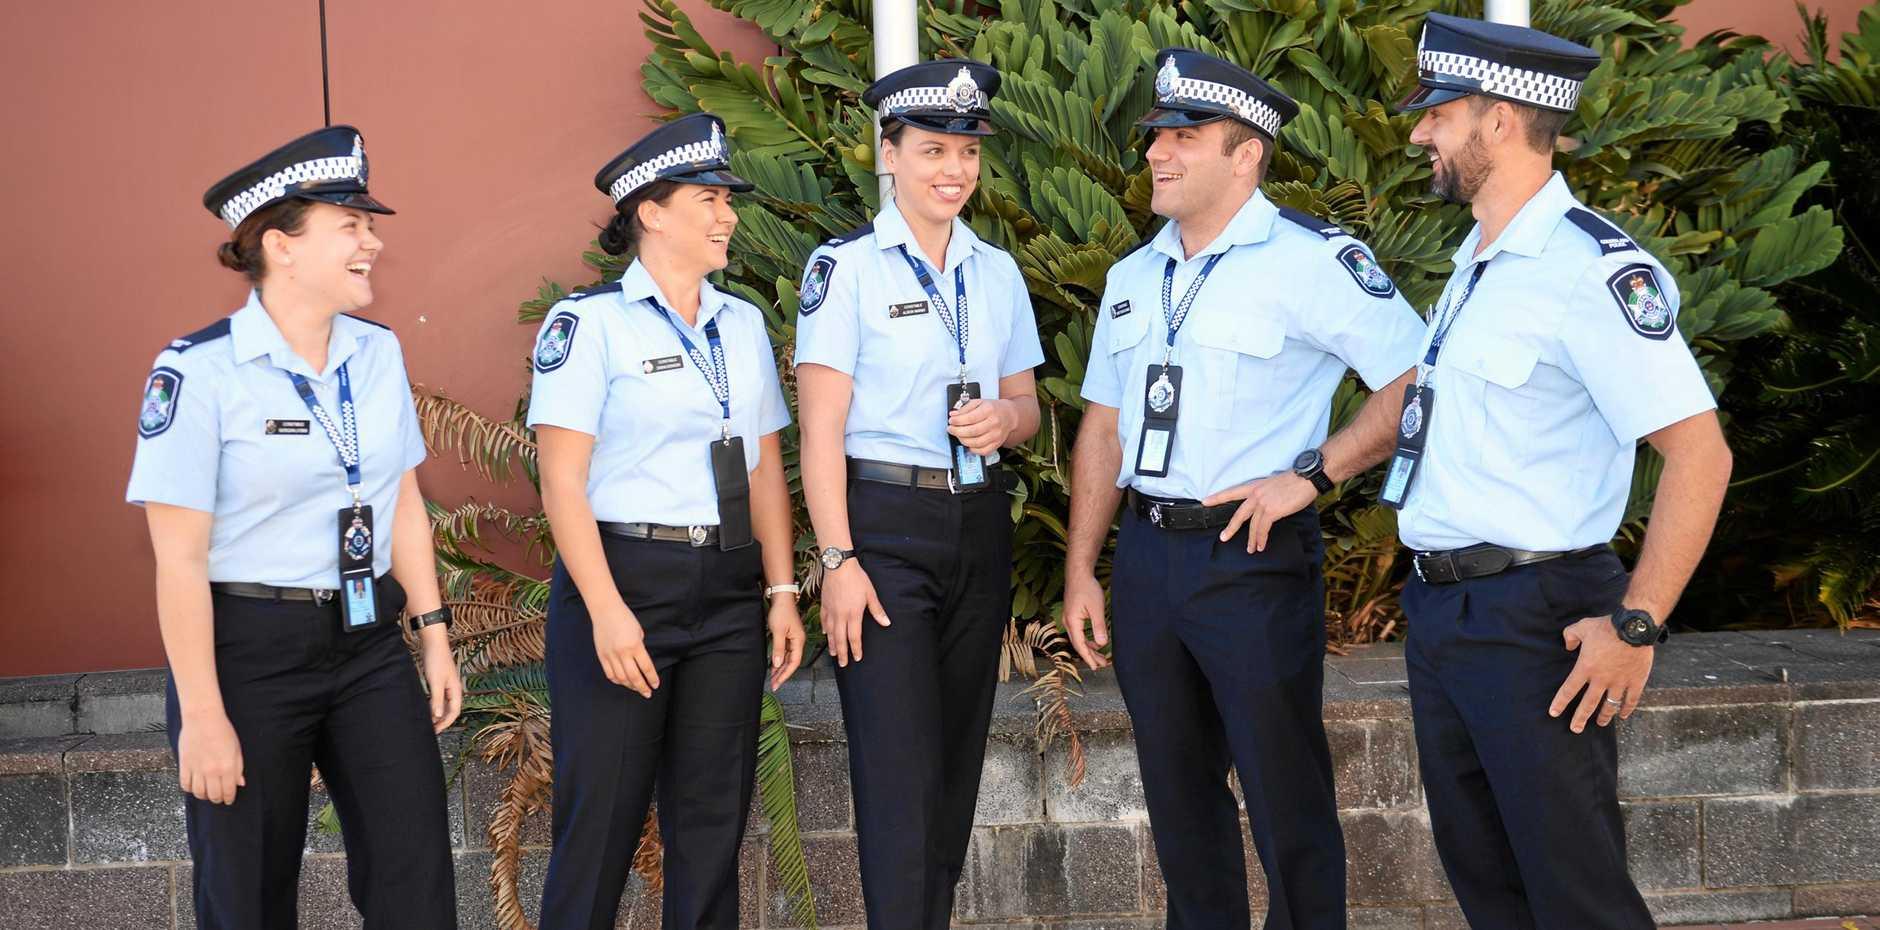 NEW RECRUITS: Rockhampton's newest police recruits Constable Morgan Lyons, Constable Dianna Sovacki, Constable Alison Marsh, Constable Matthew Daniel and Constable Wian Schwartz.